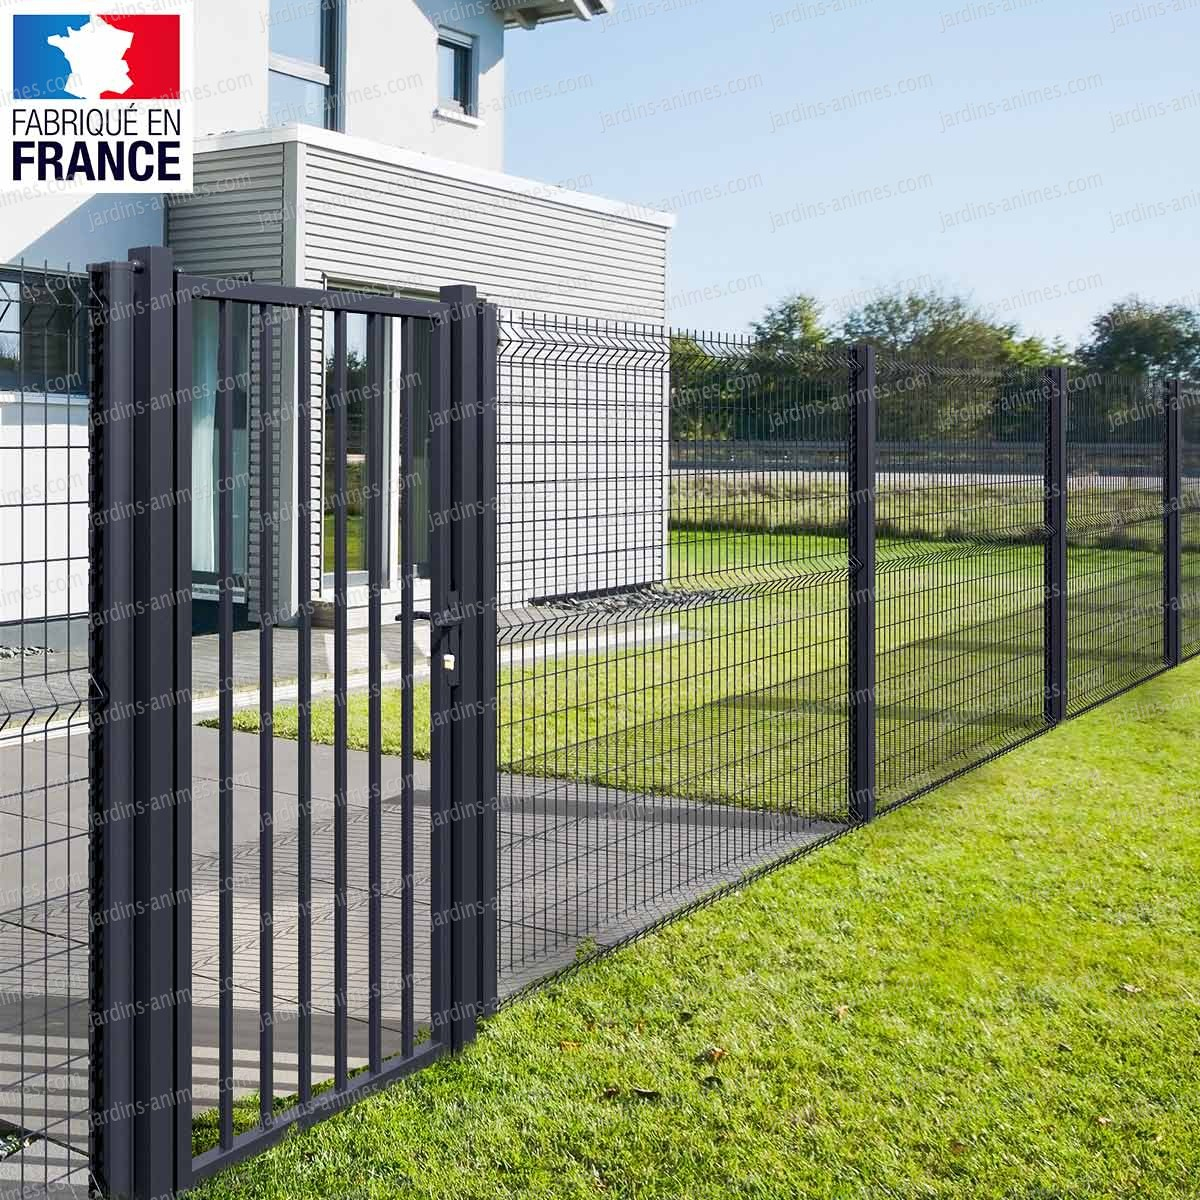 Clôture Grillage Rigide - Maille 10X5.5Cm, Gris concernant Grillage De Jardin Rigide